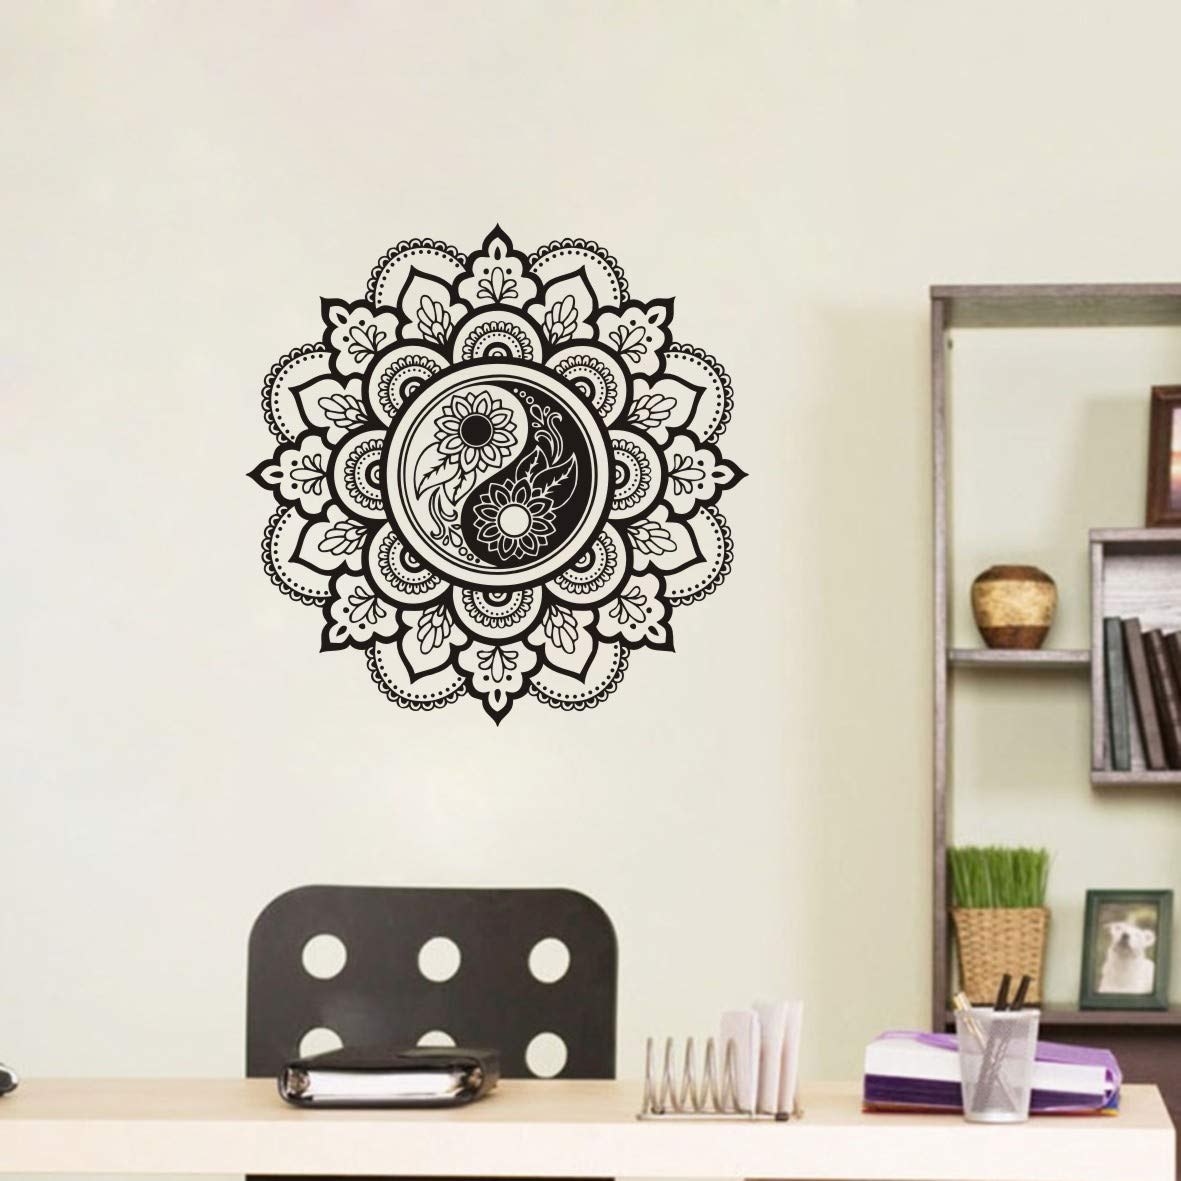 Yin Yang Mandala Flower Room Decoration Vinyl Wall Sticker Art Removable Poster Kids Nursery Bedroom Wall Decal LY941 Black